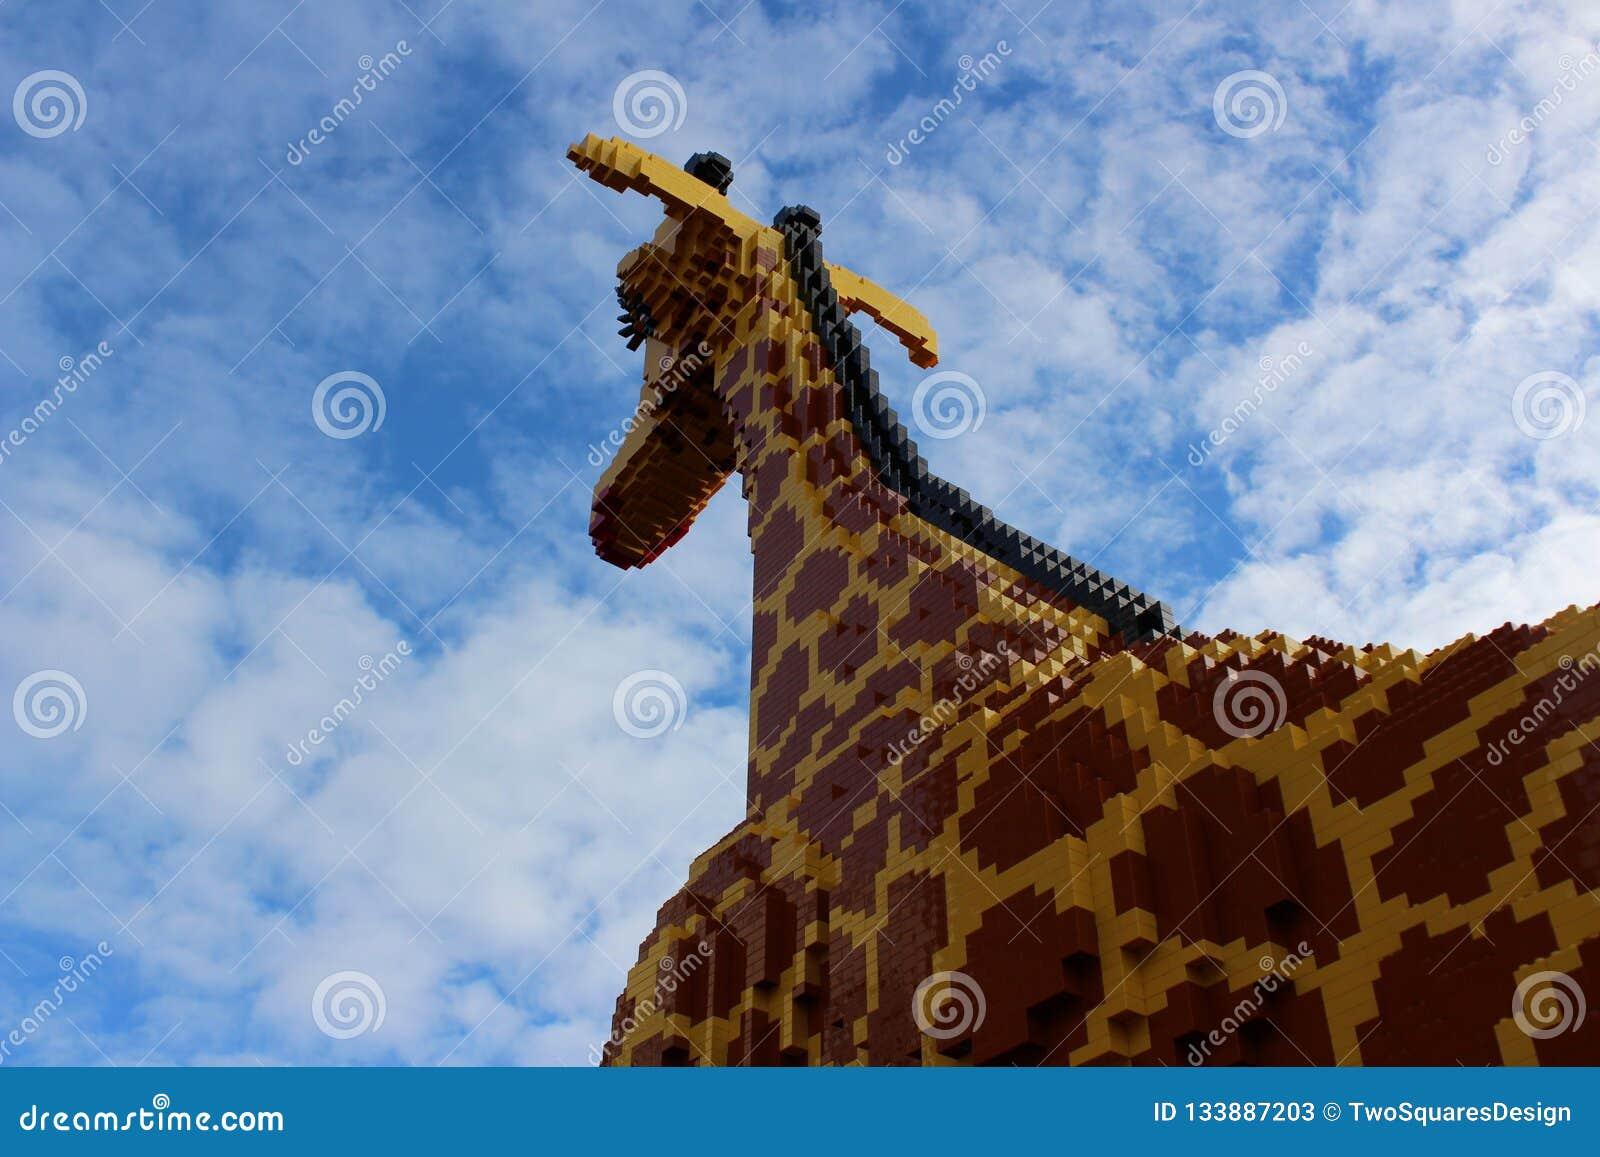 A Big Giraffe builded from plastic bricks.